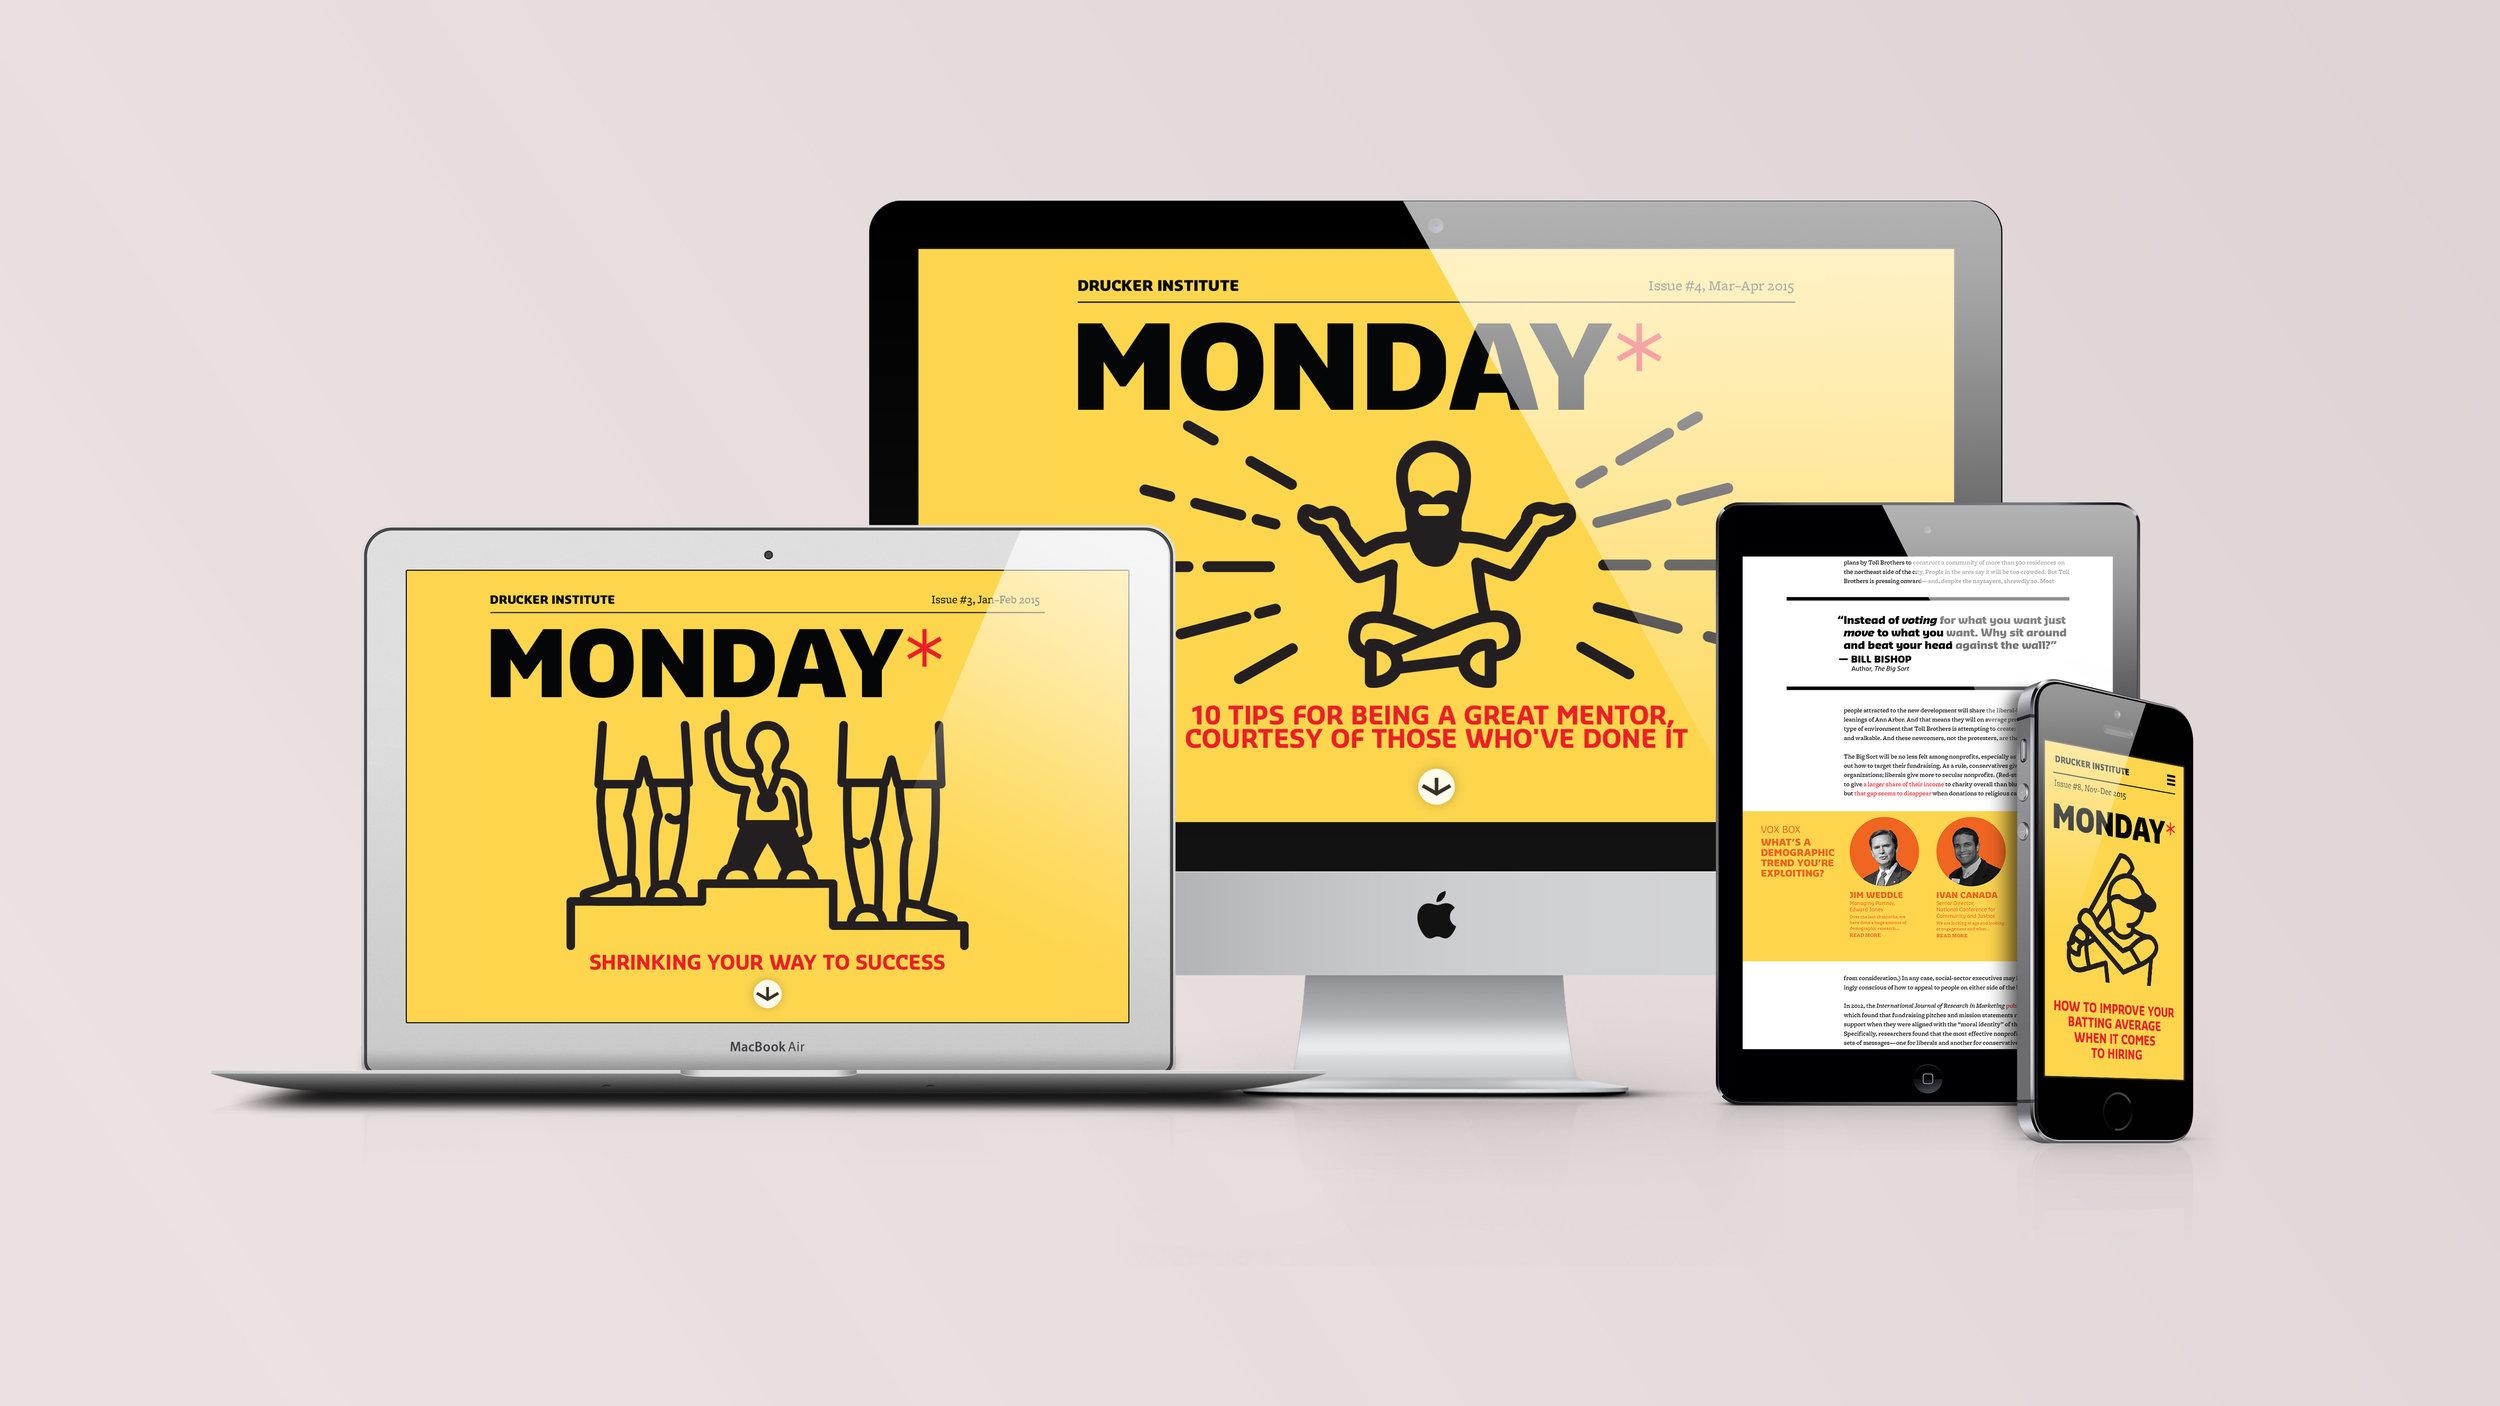 MONDAY-devices@2x.jpg